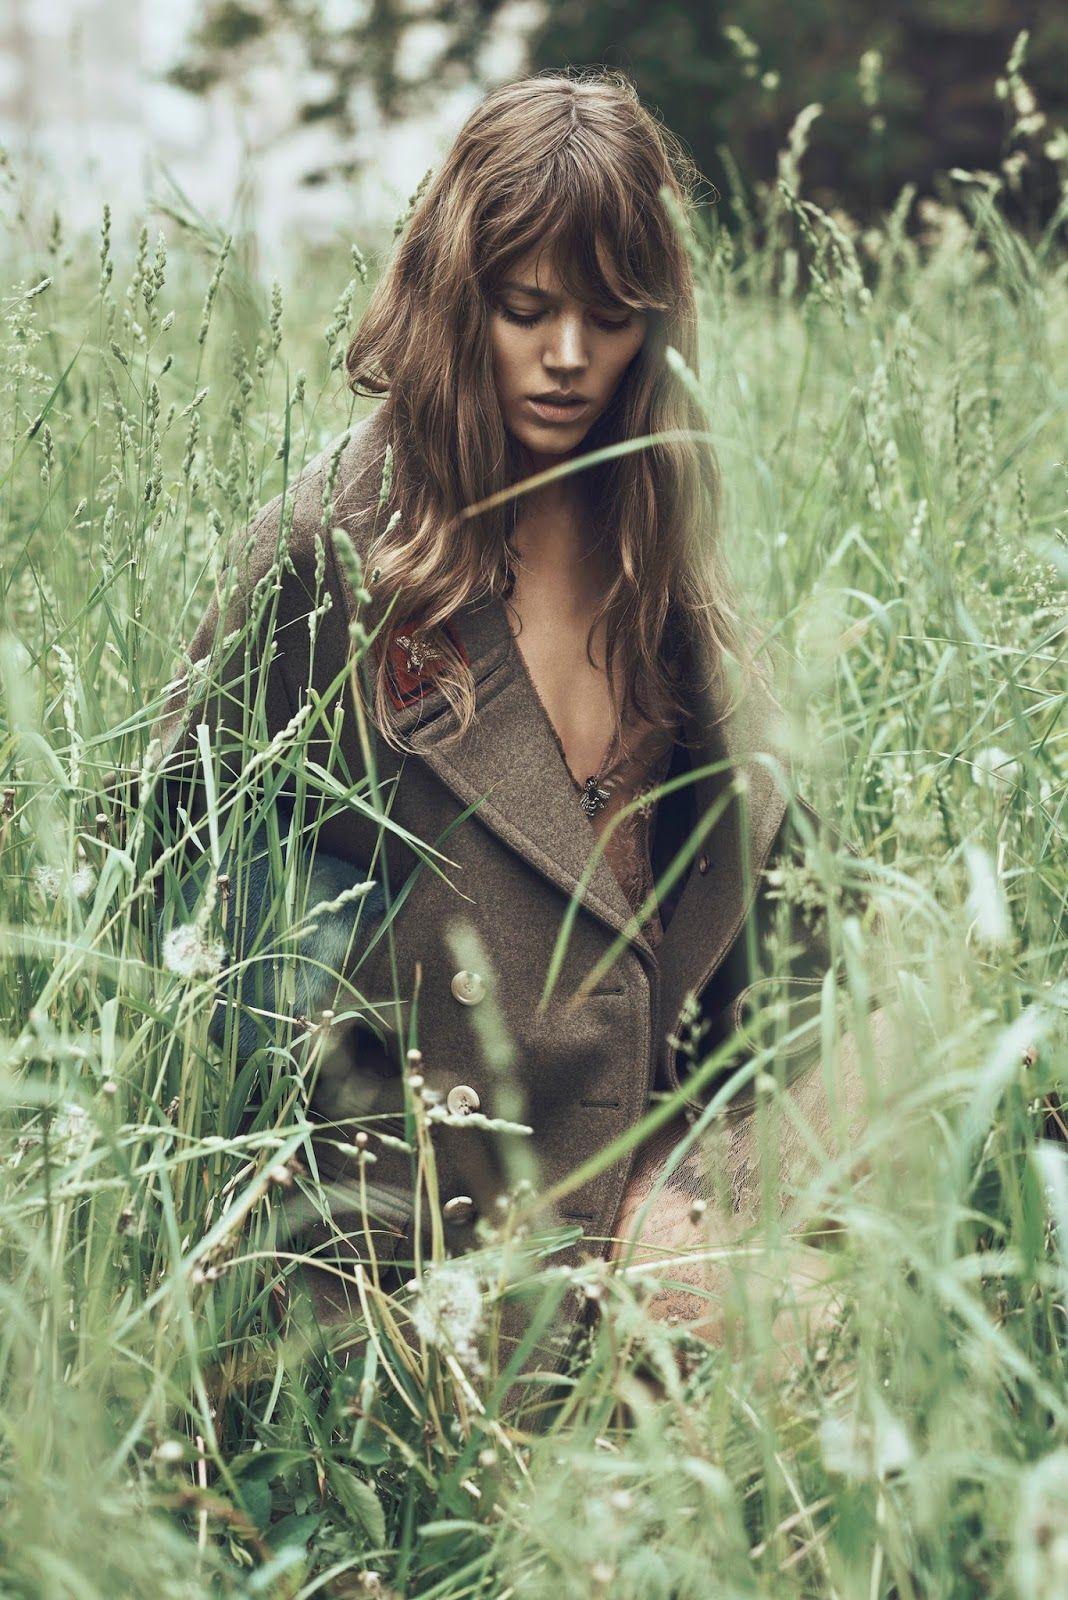 Natalie richardson sarahtaurus on pinterest